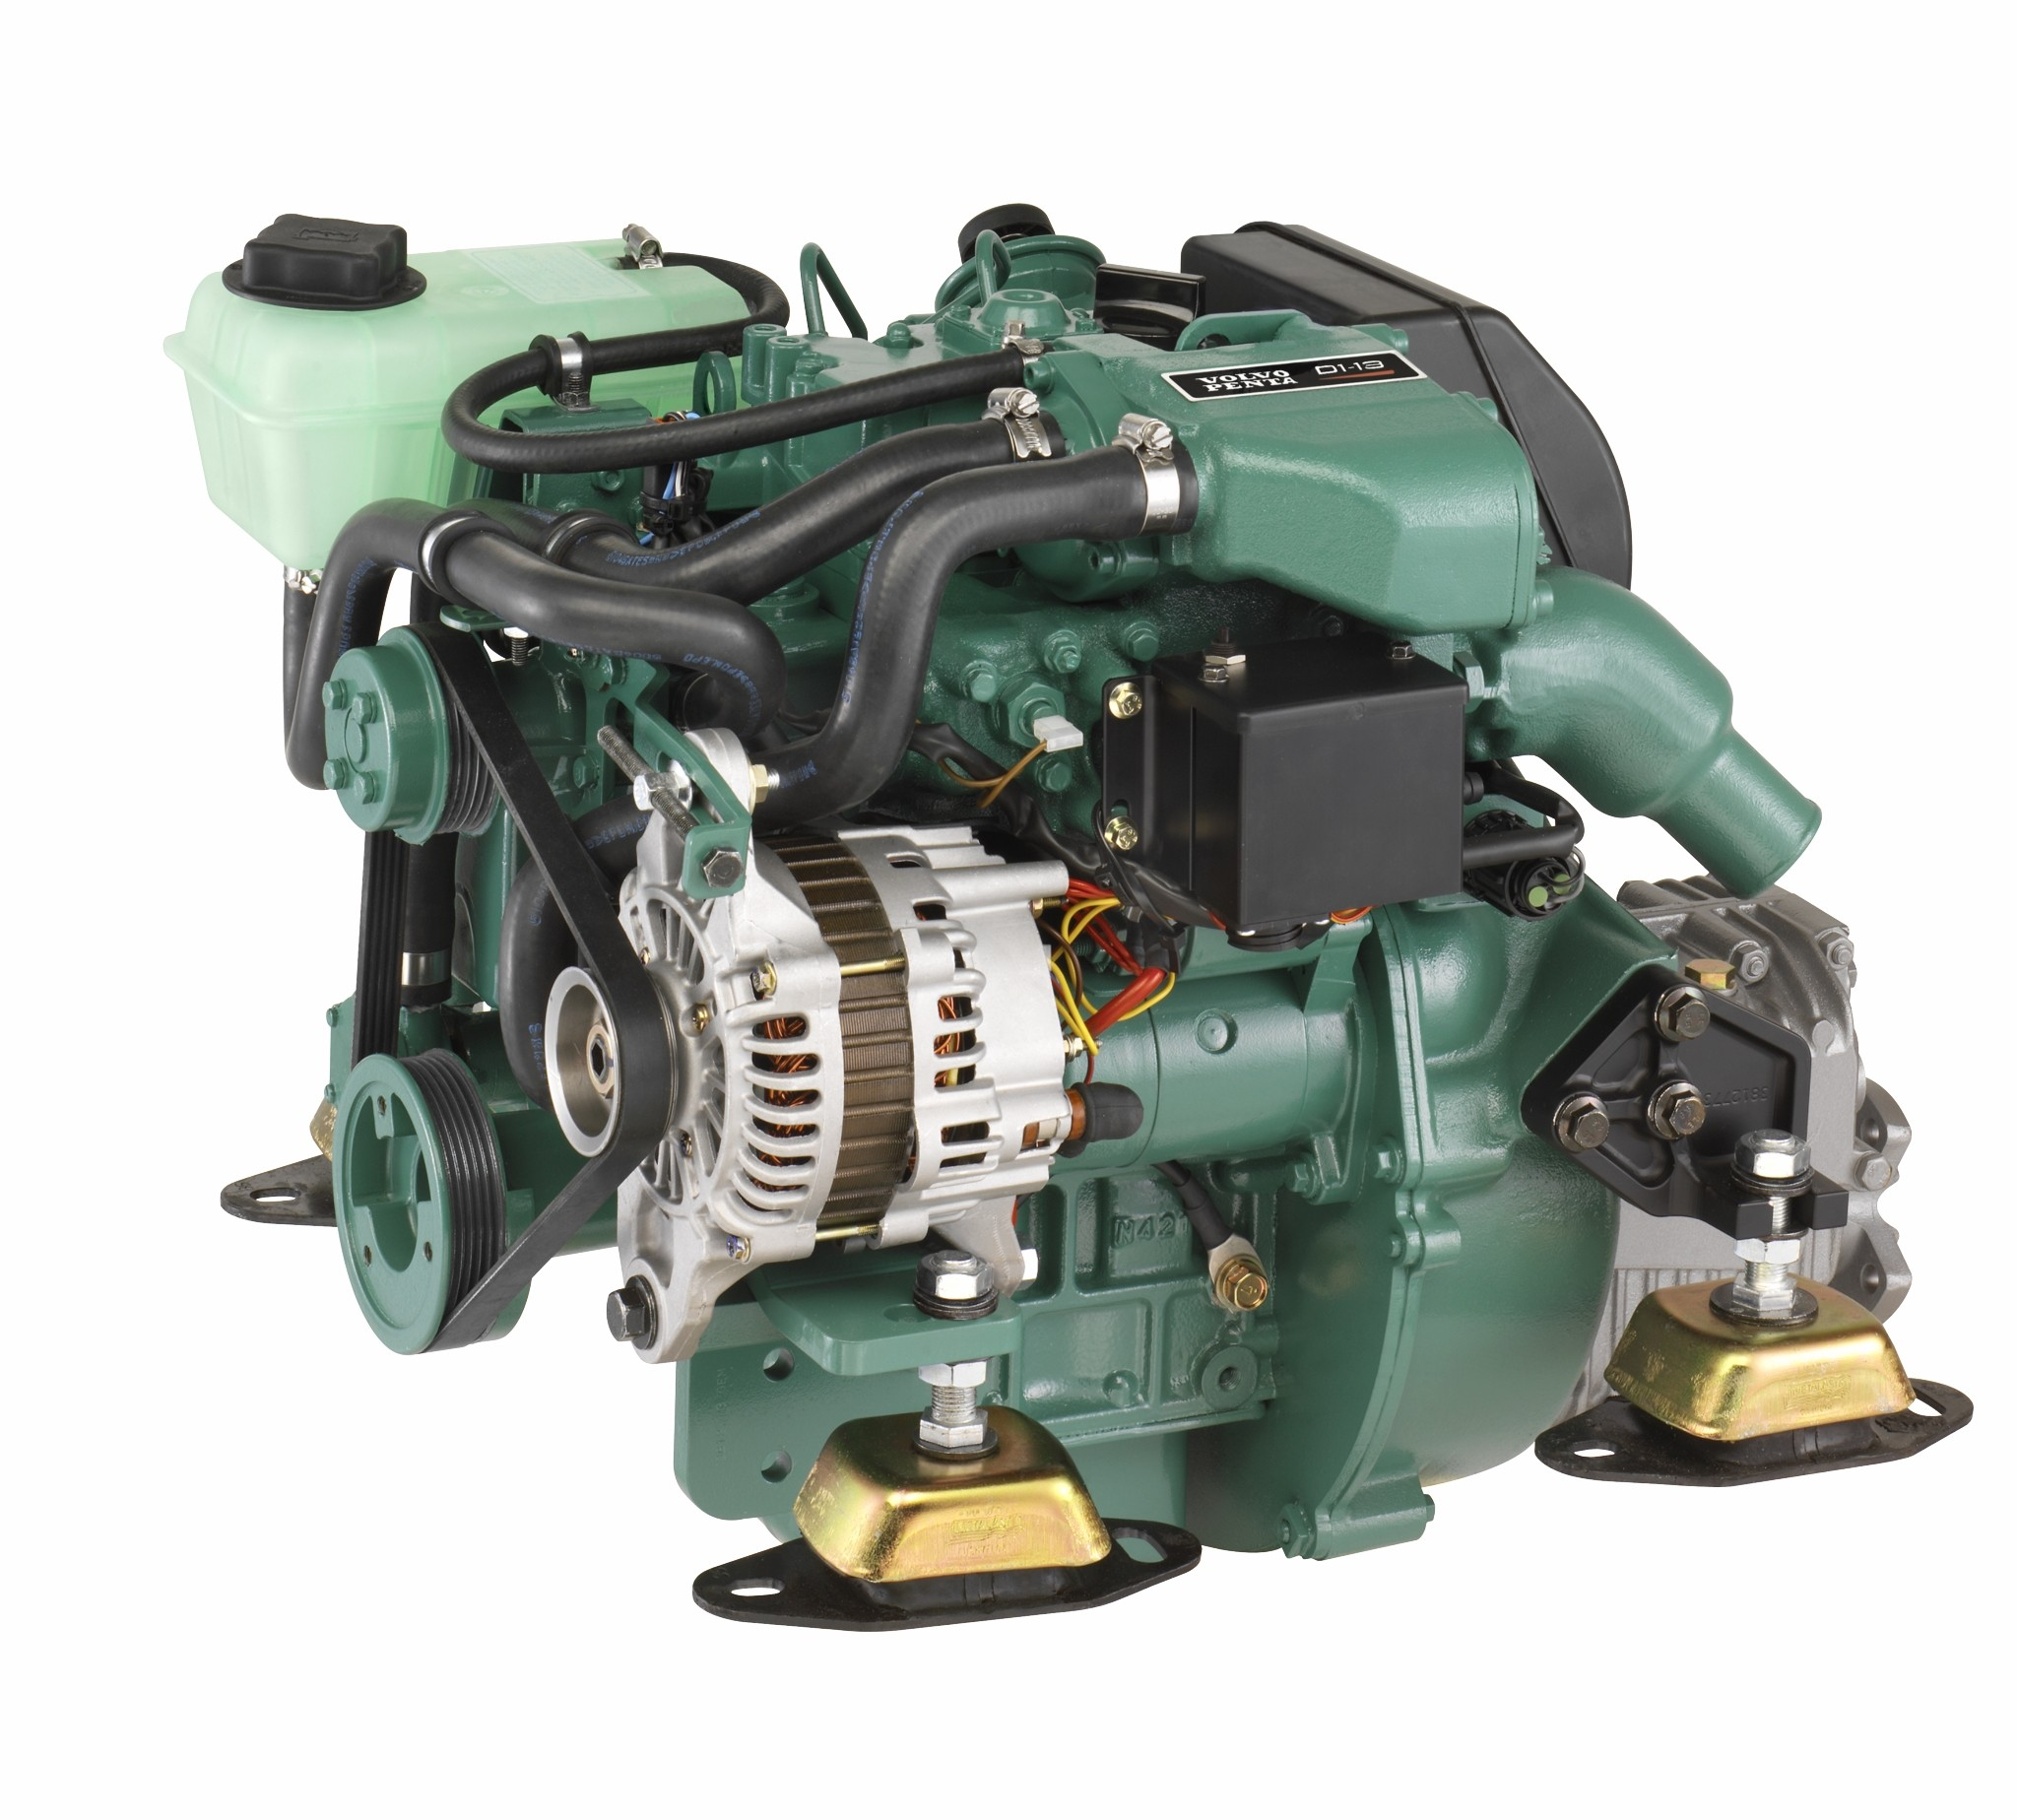 Dieselmotor D1-13 med backslag MS15